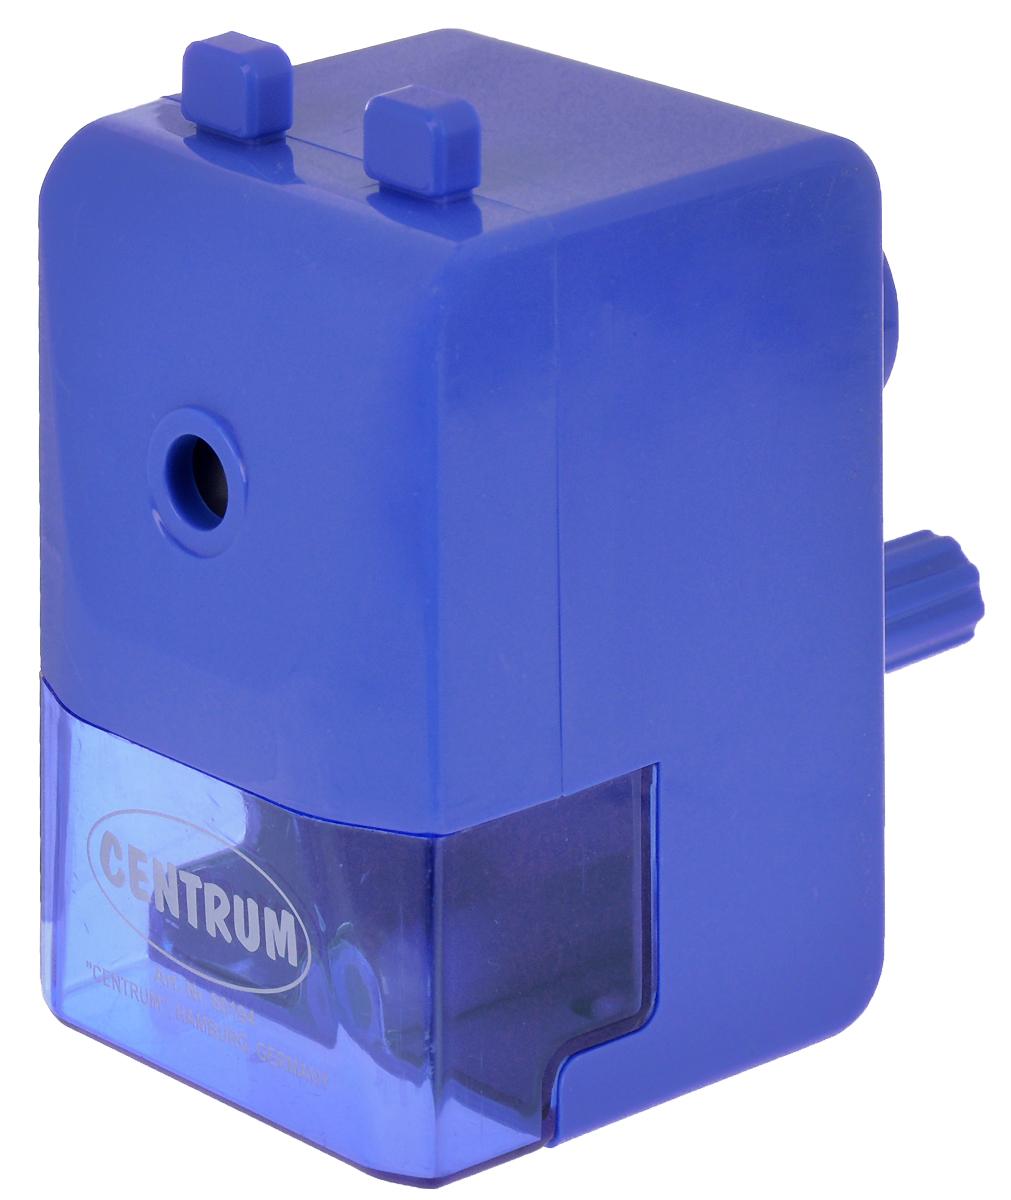 Centrum Точилка механическая цвет синий80194_синийCentrum Точилка механическая цвет синий